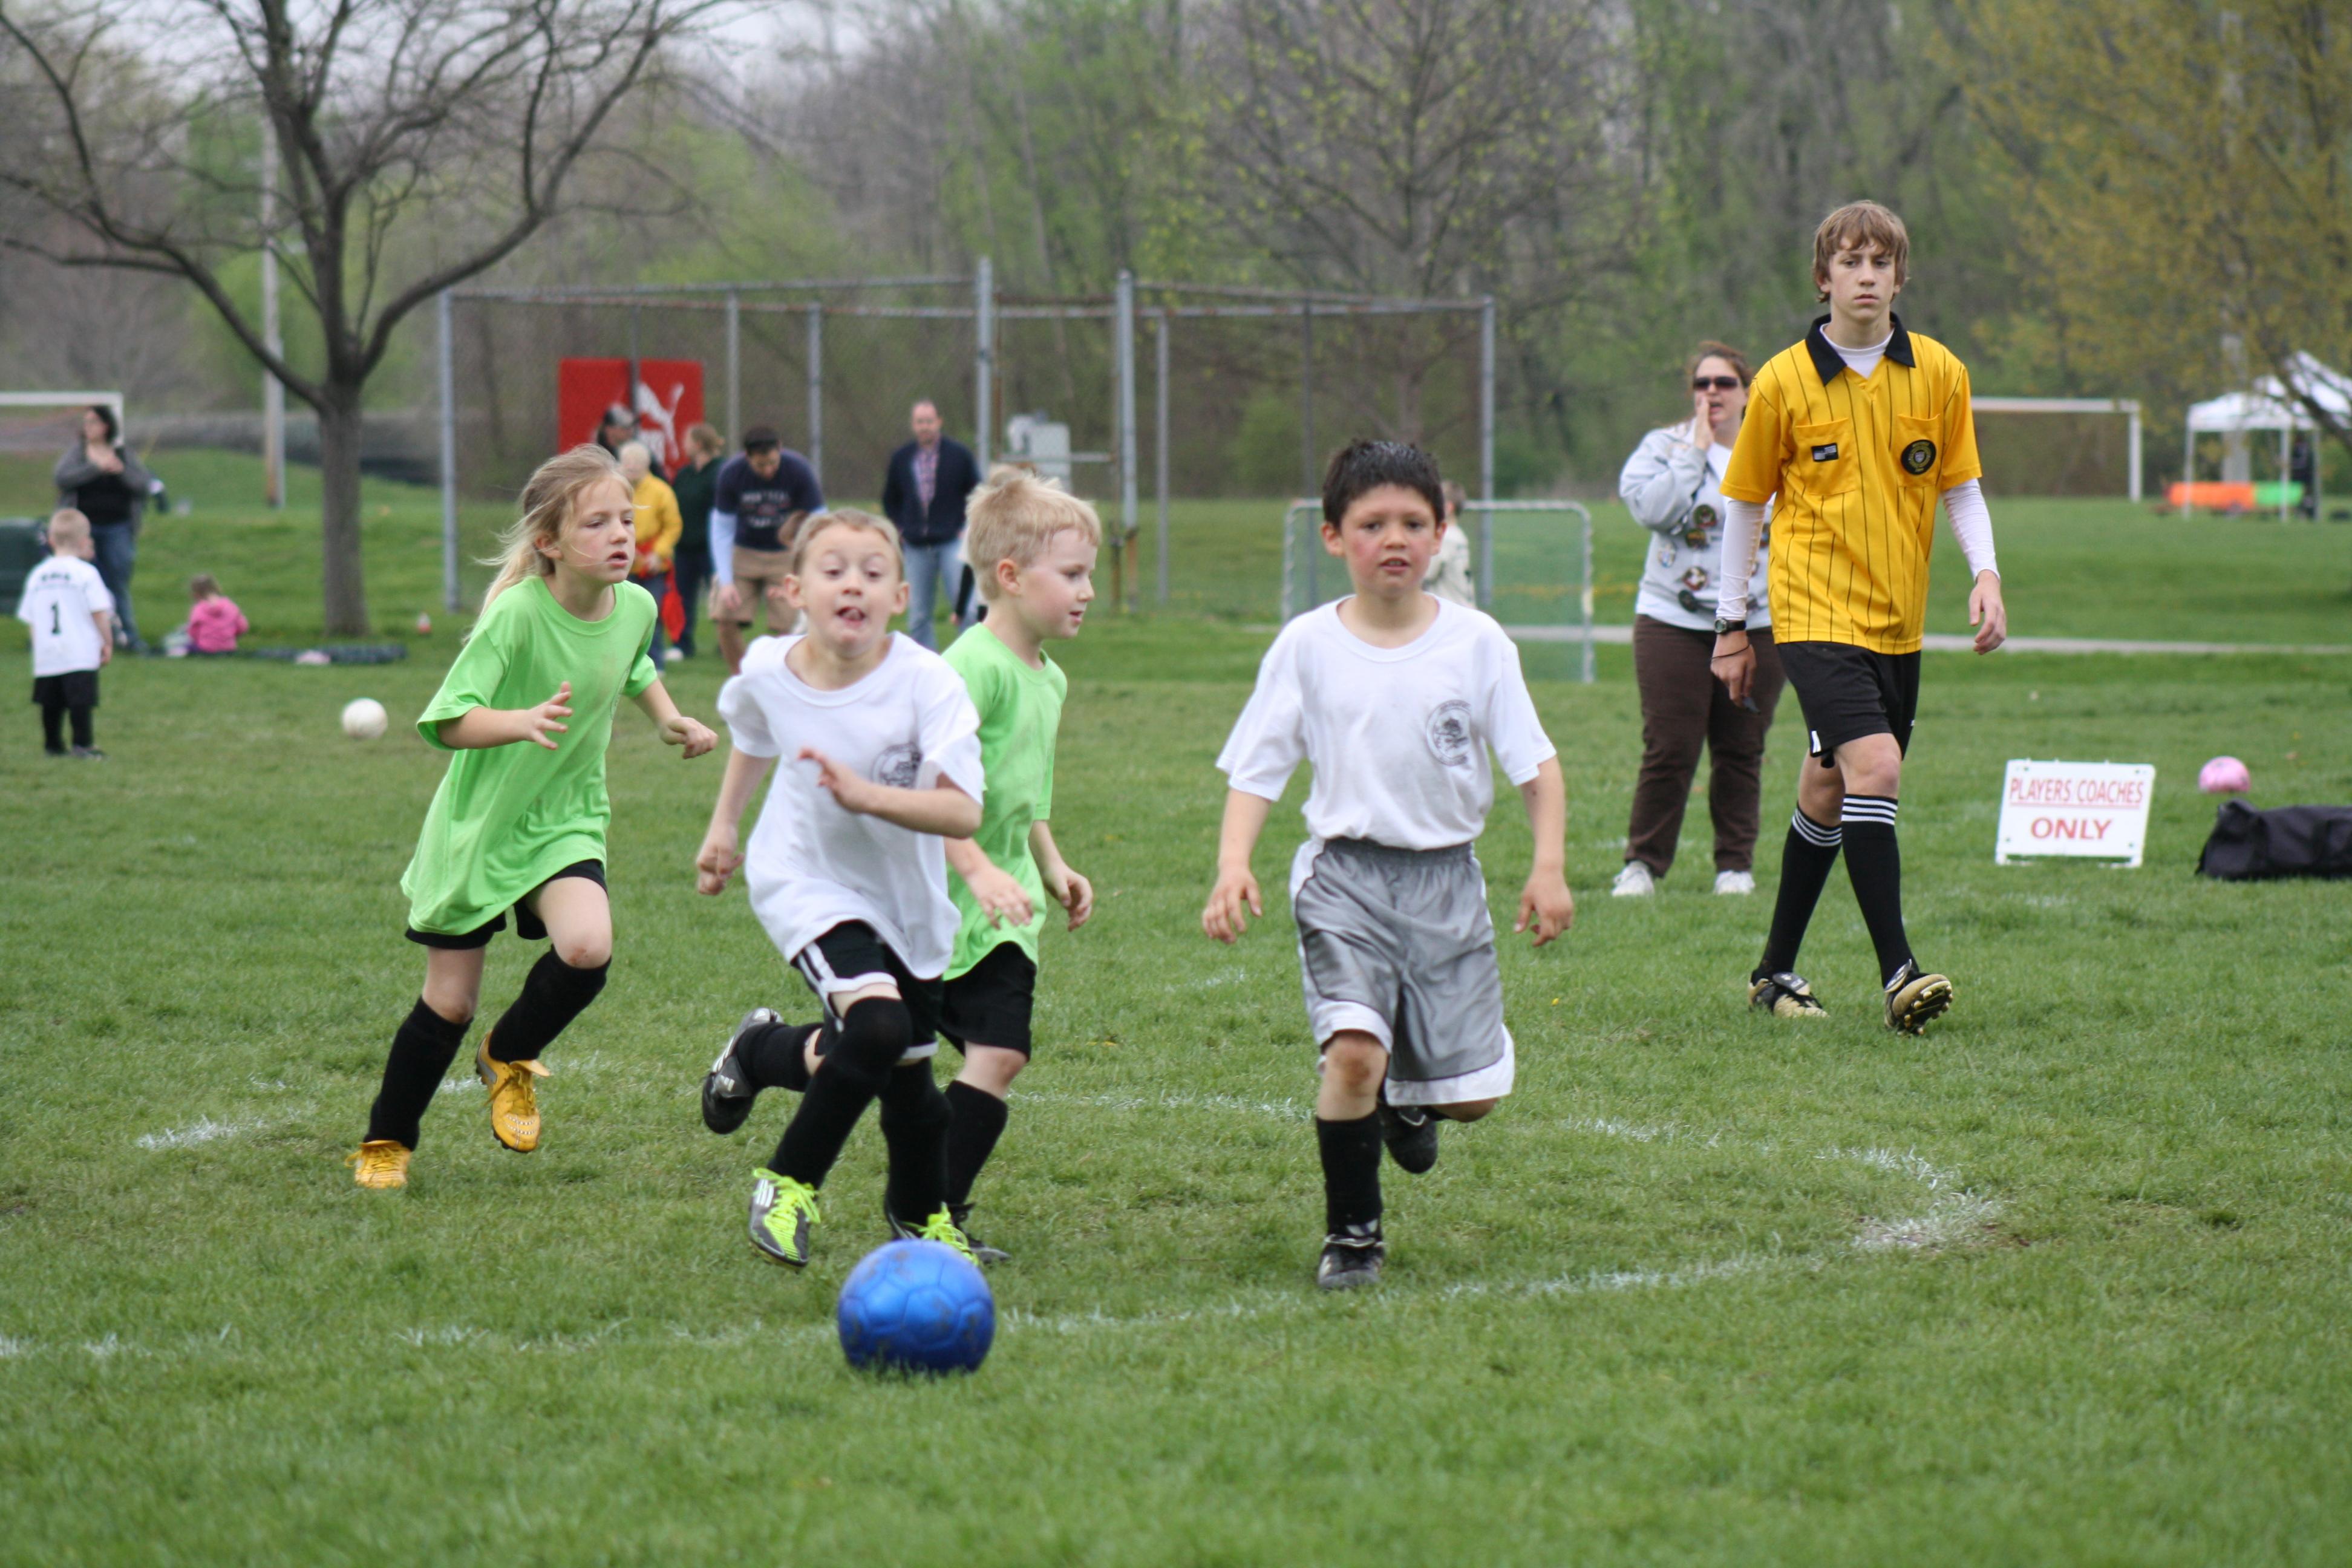 tigersfc recreational soccer